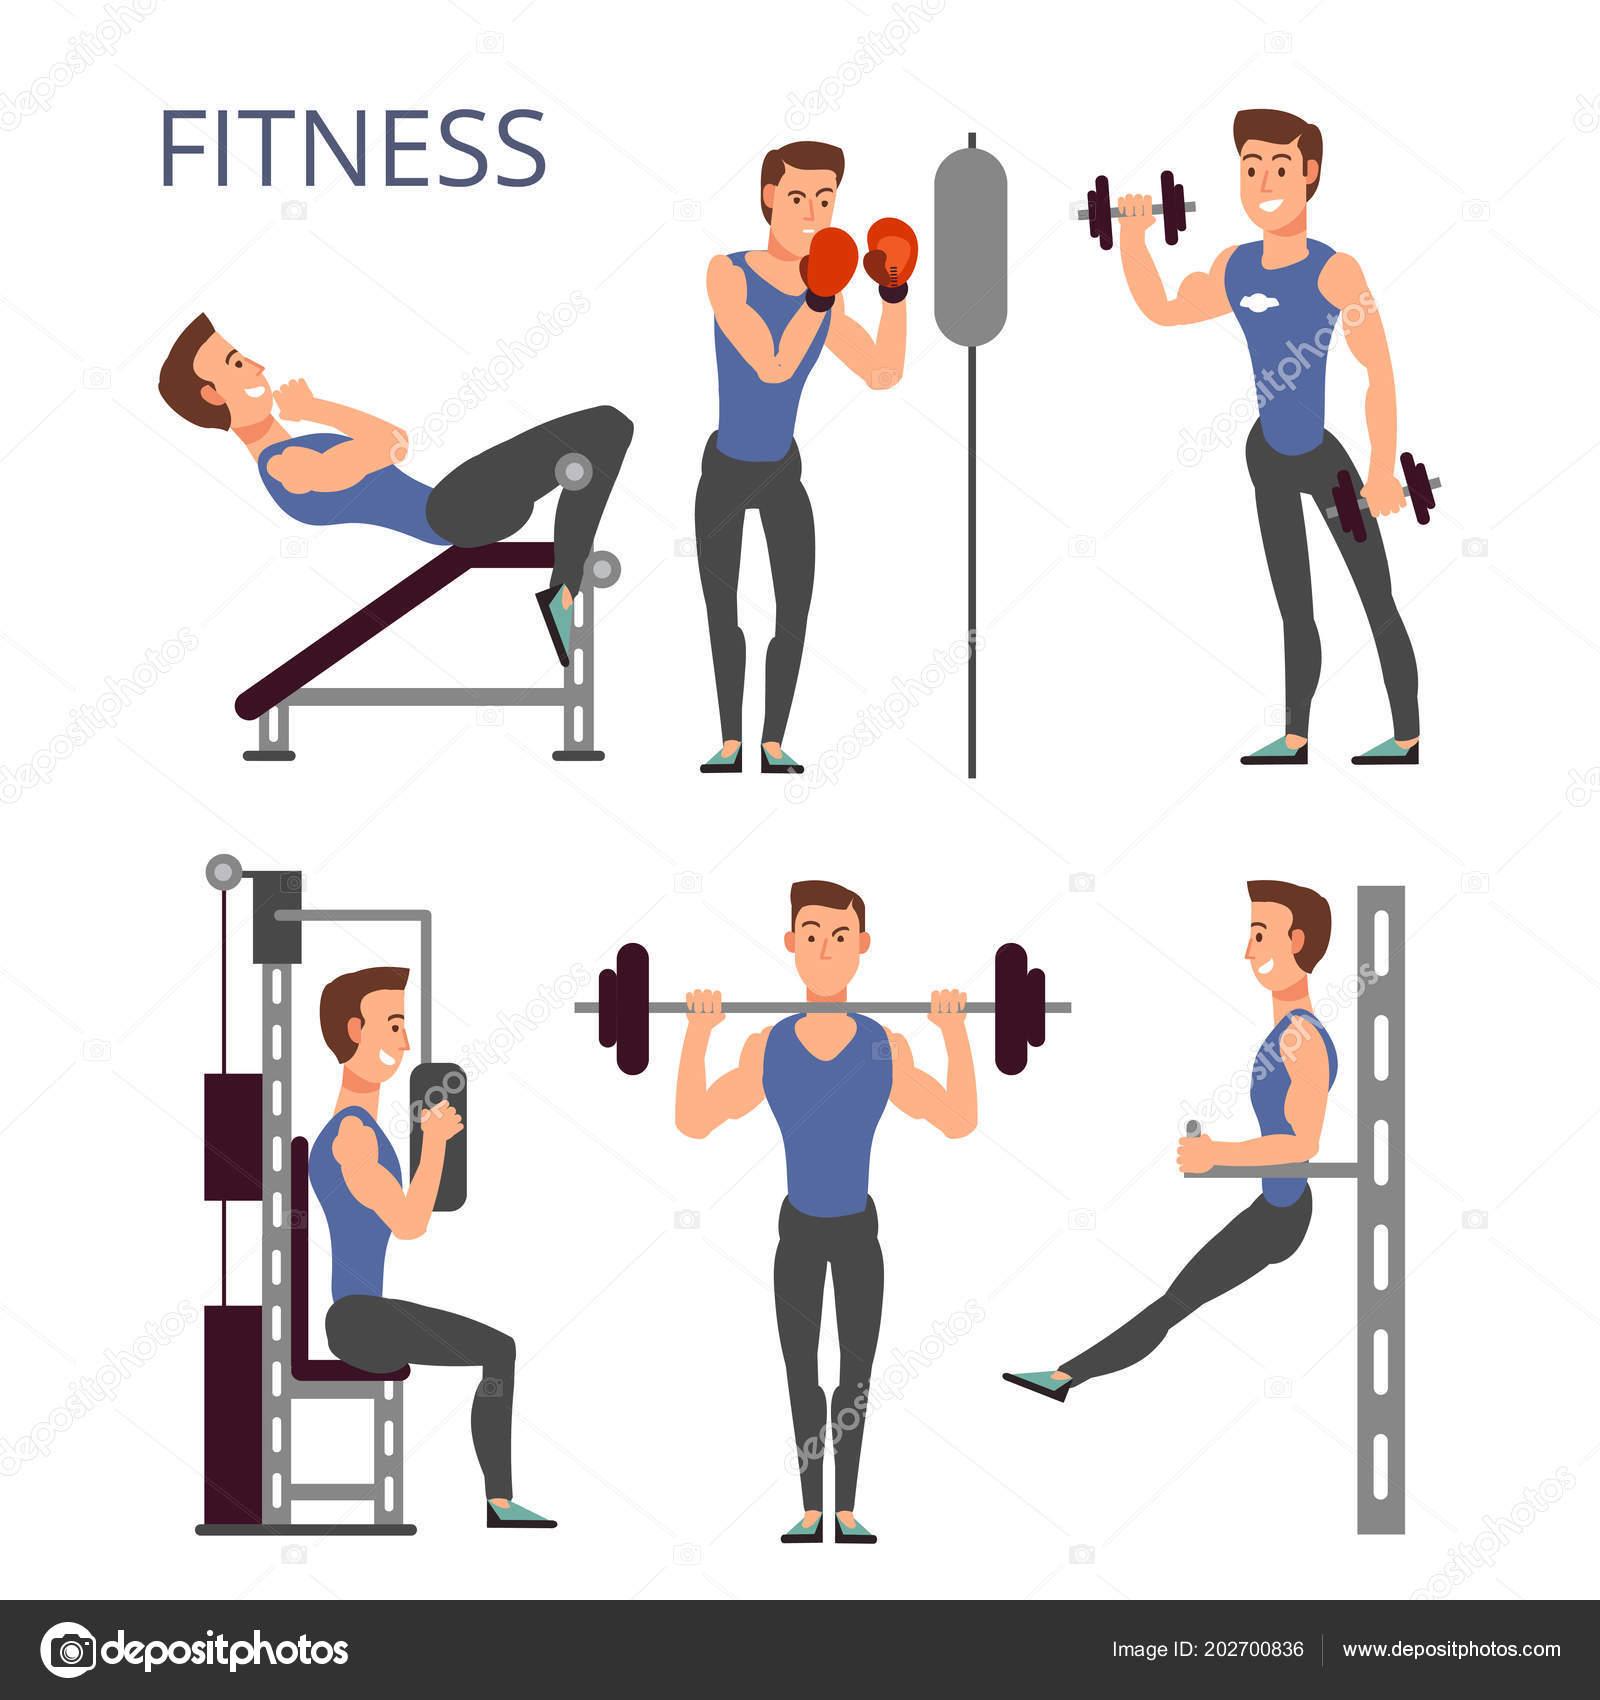 Fonkelnieuw Gym exercises, body pump workout vector set with cartoon sport man ZK-41